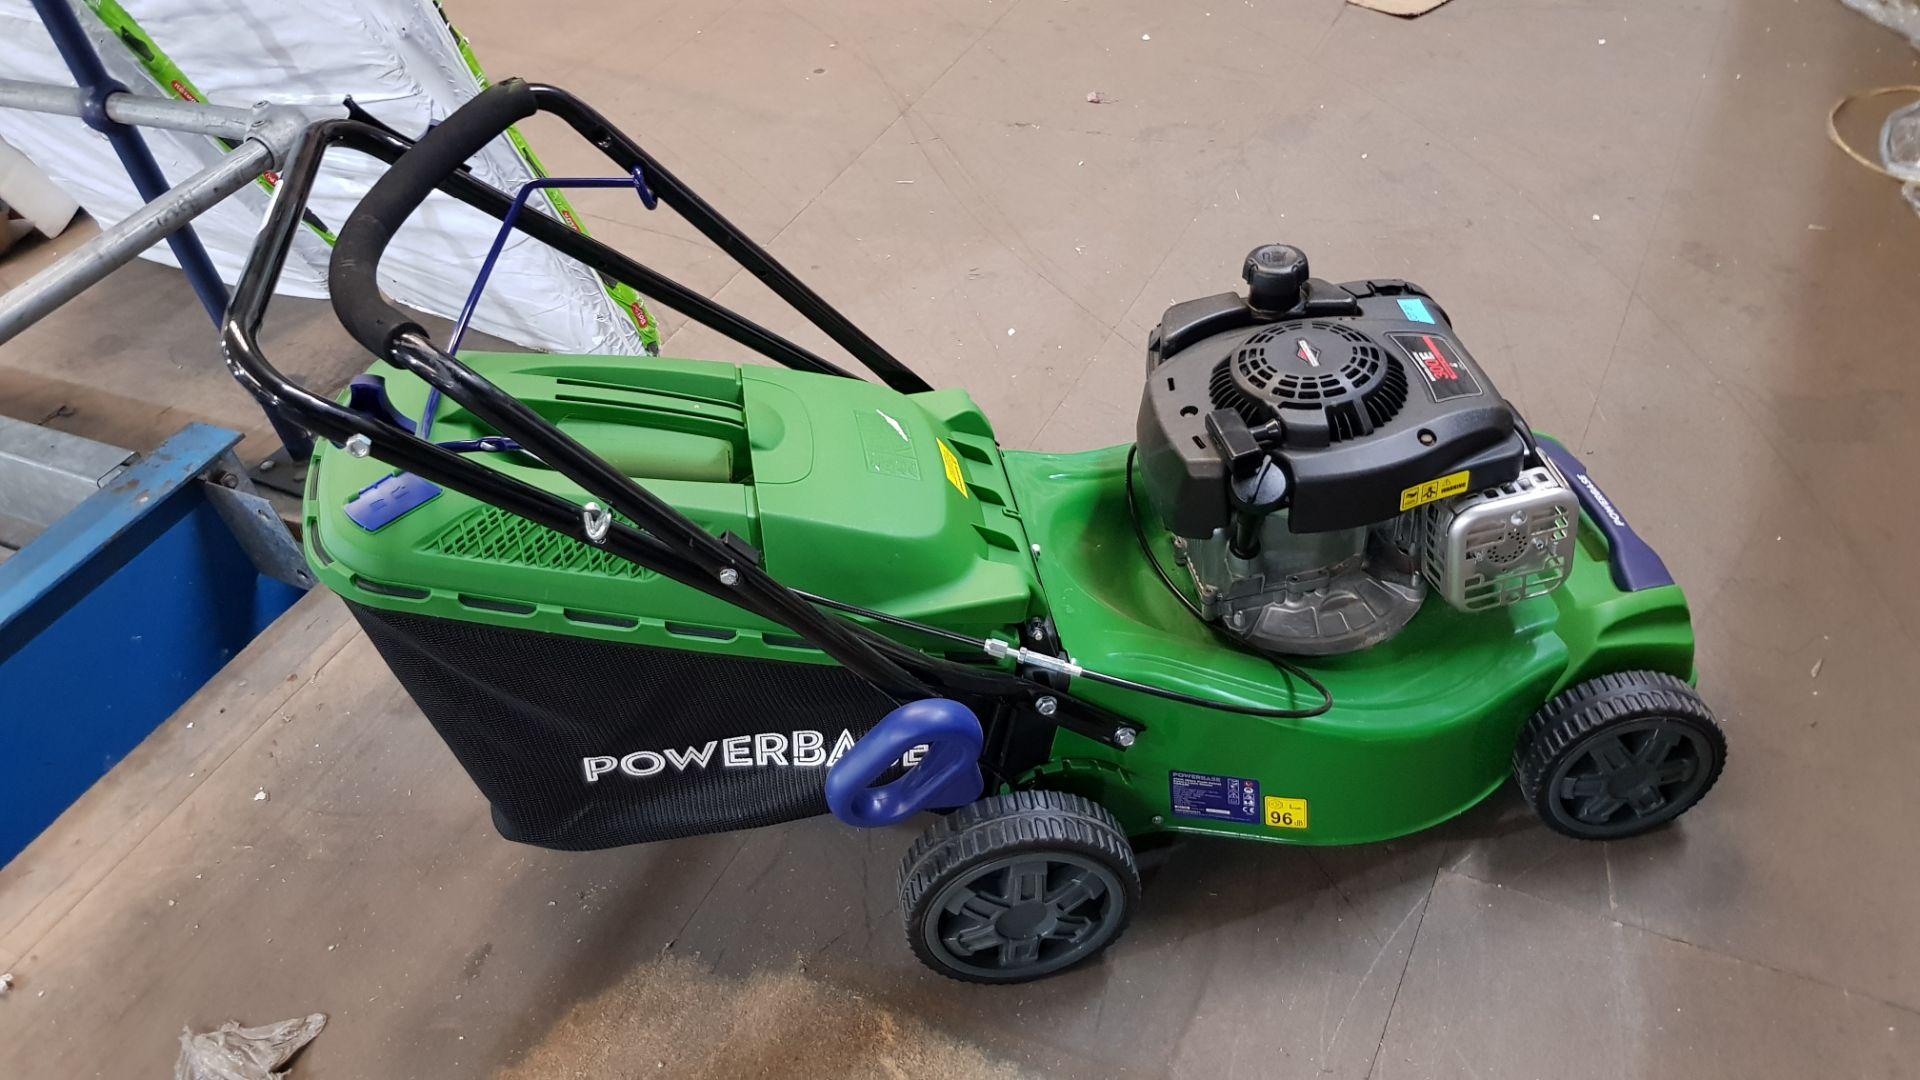 (P10) 1x Powerbase 41cm 125cc Push Petrol Rotary Lawn Mower (XSS41D) RRP £199. New, Clean Unused I - Image 5 of 8